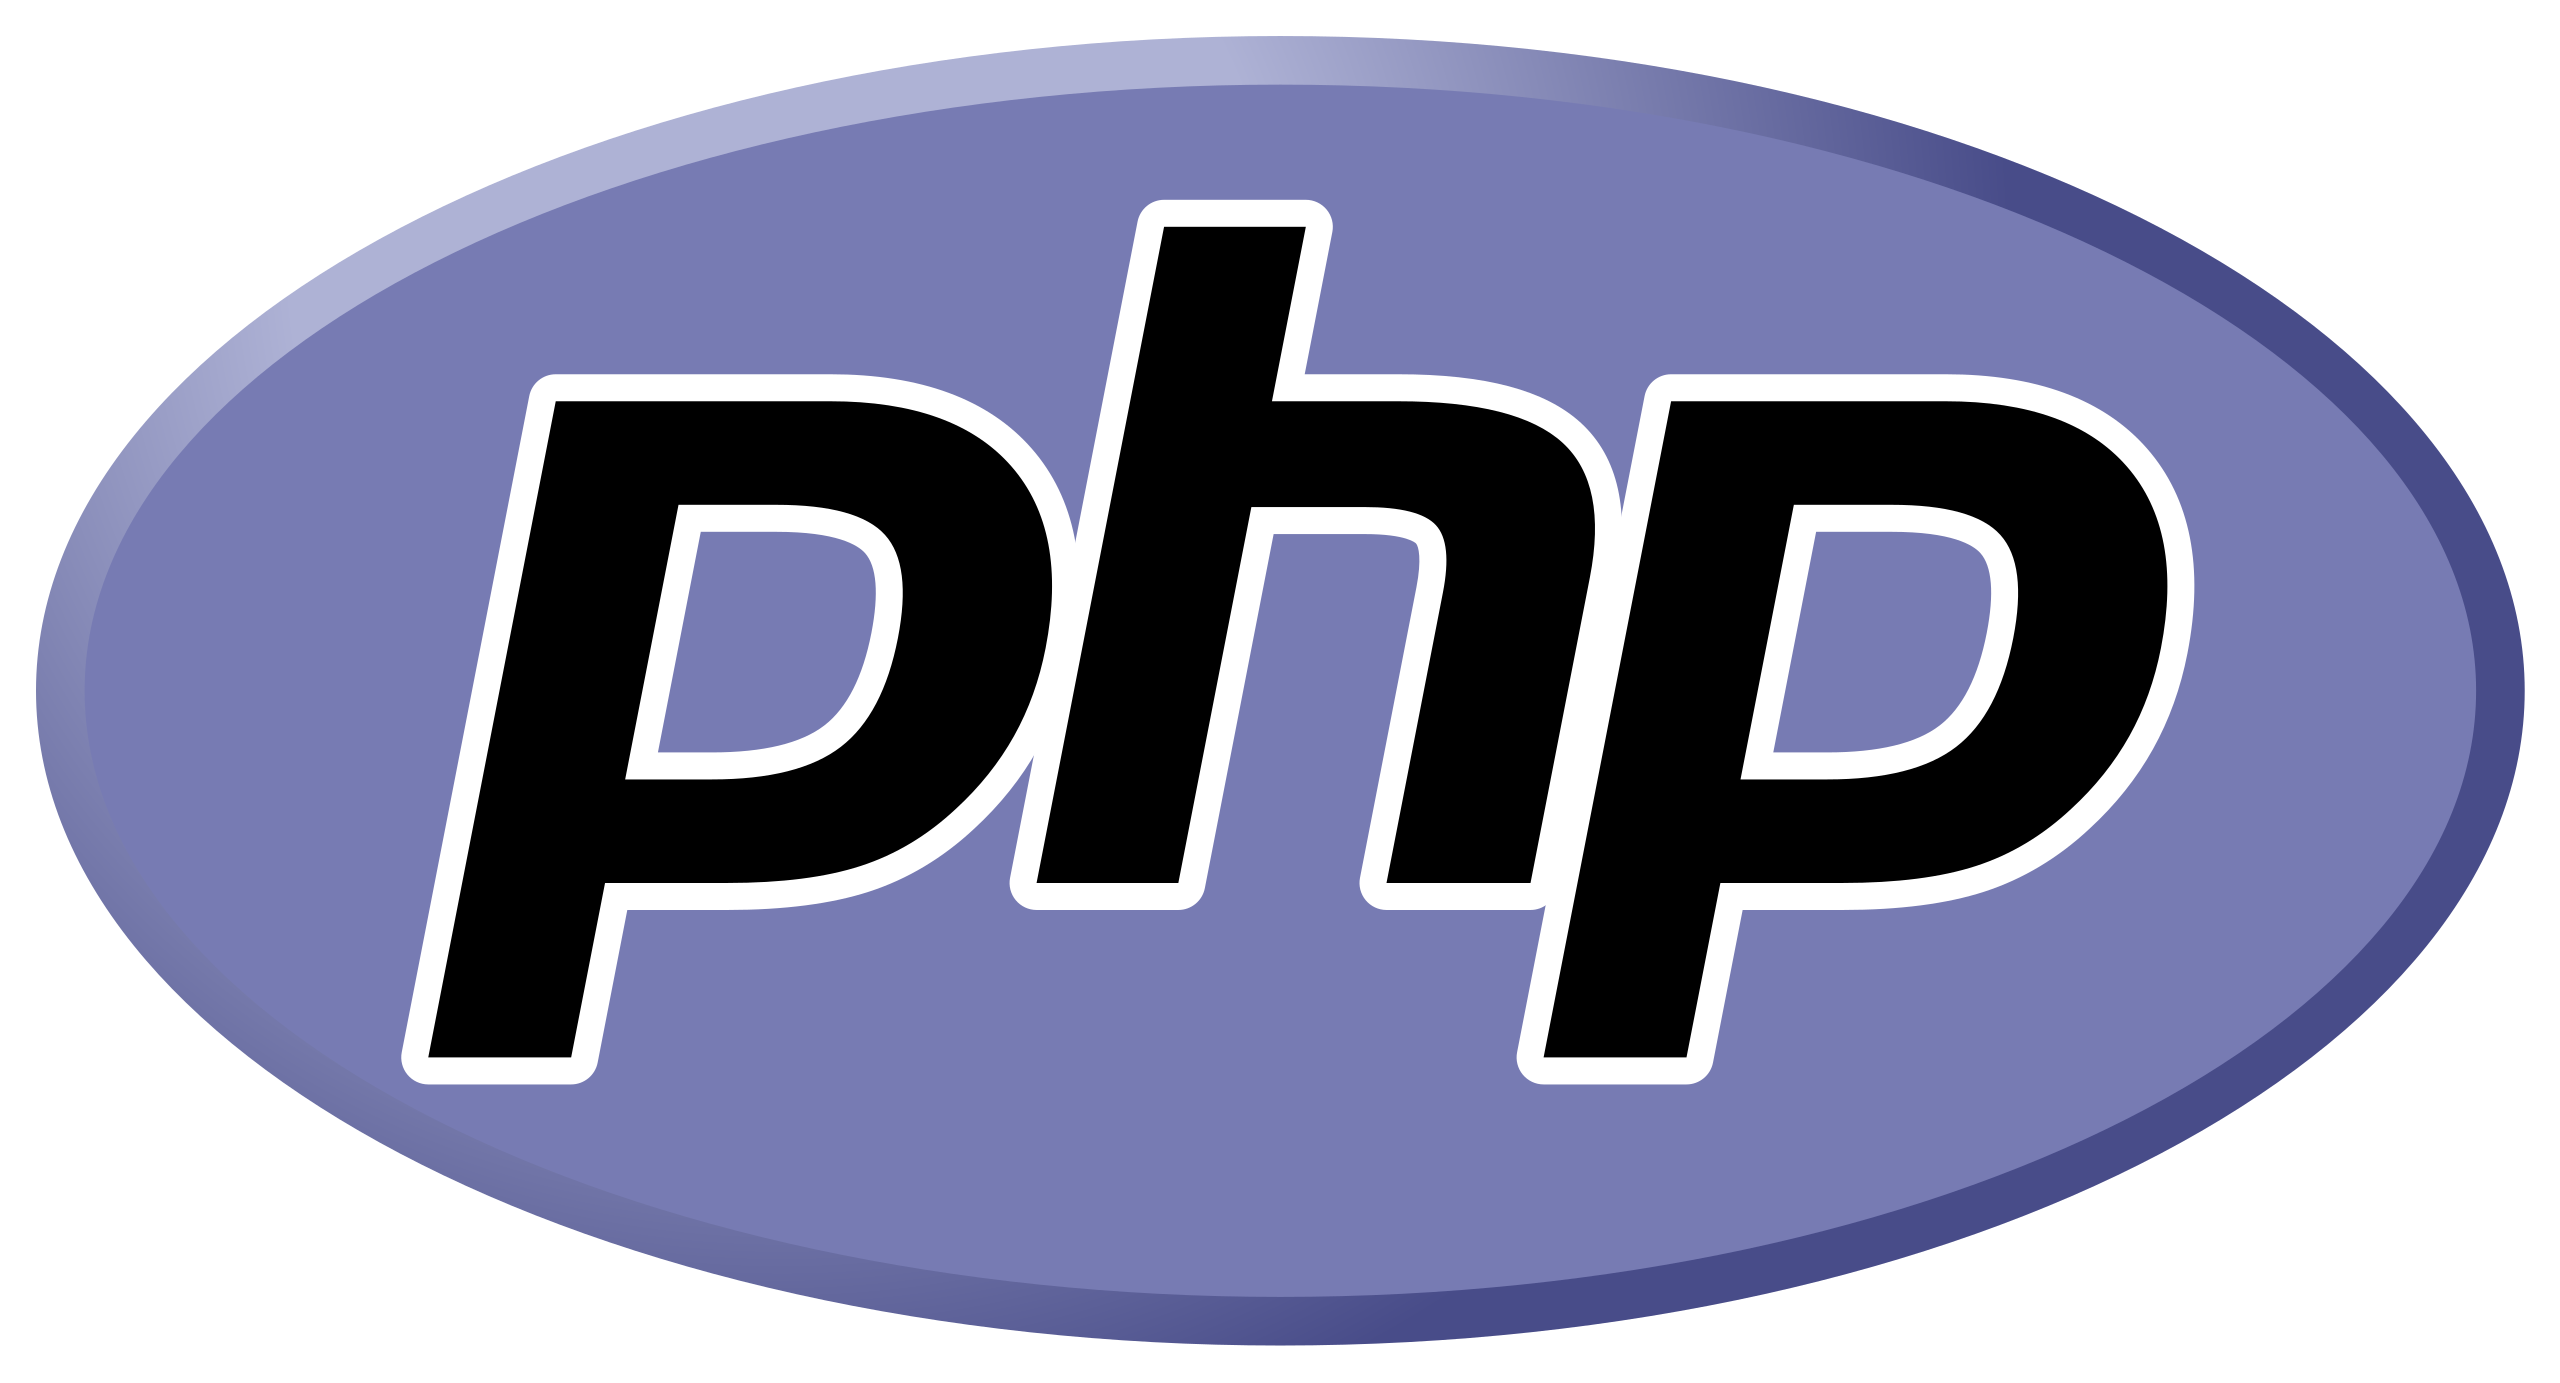 【PHP】WindowsでPHP7.4.4をインストールする方法